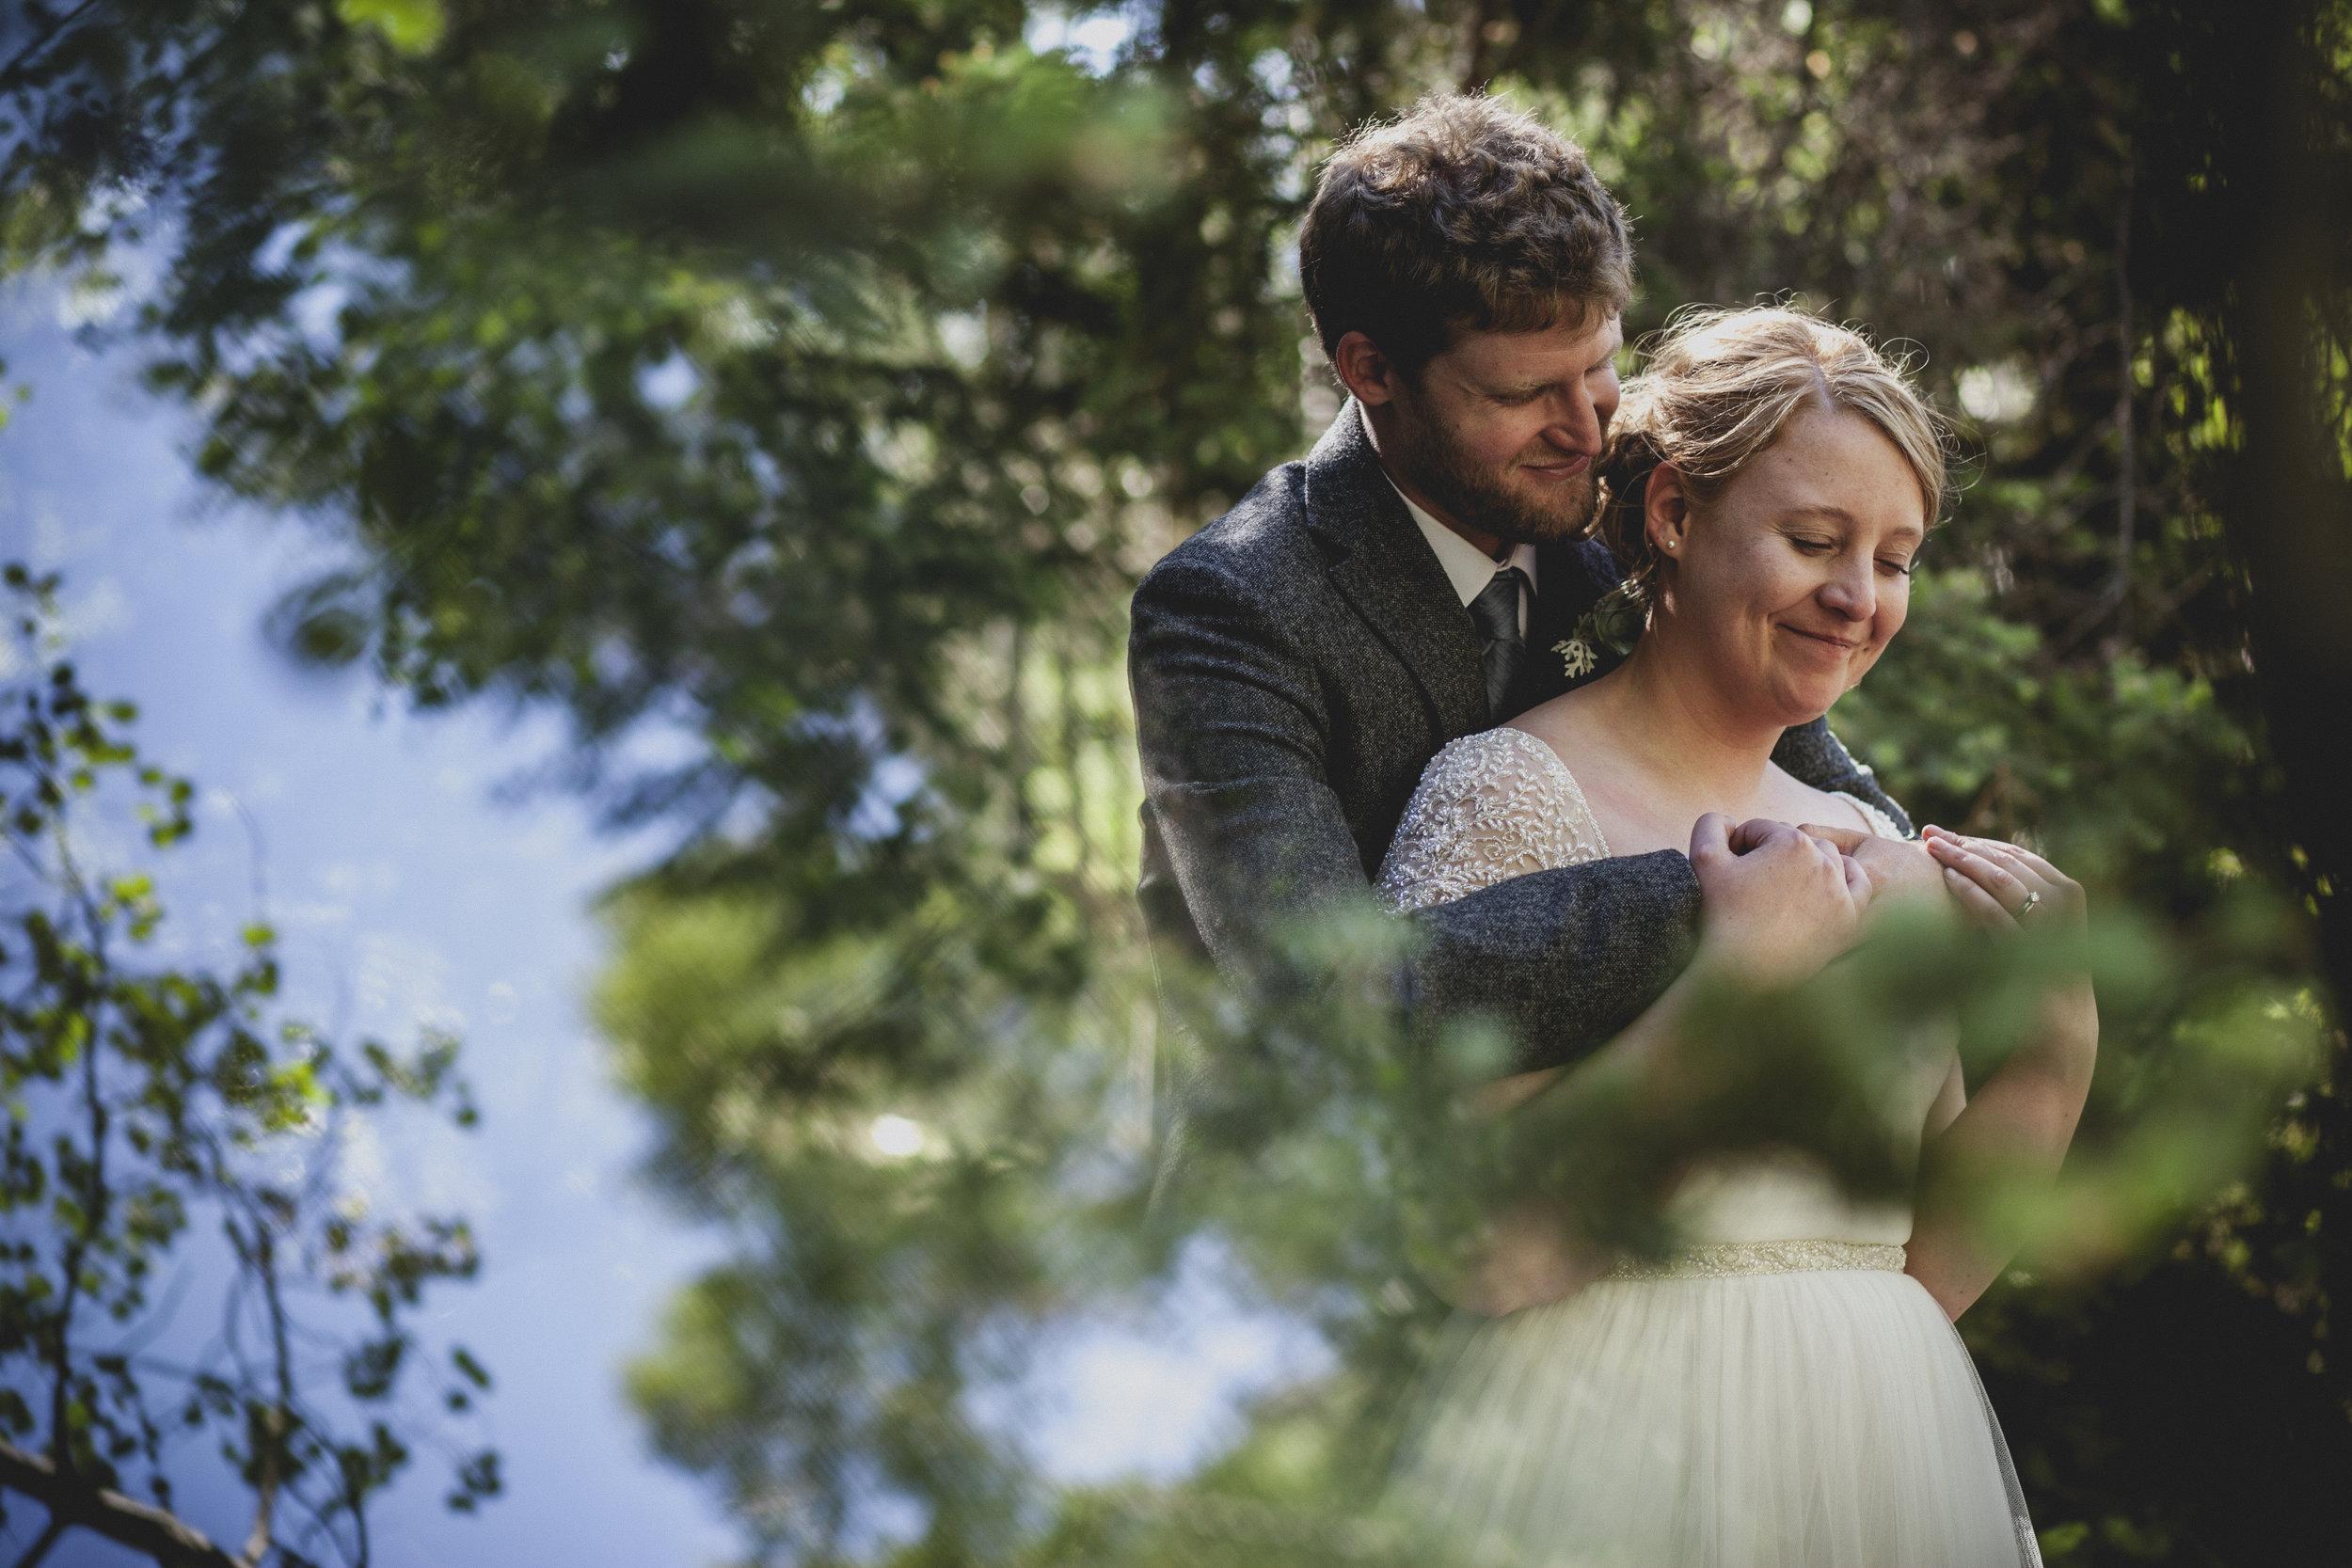 Telluride-wedding-photography-leahandashtonphotography-3156.jpg